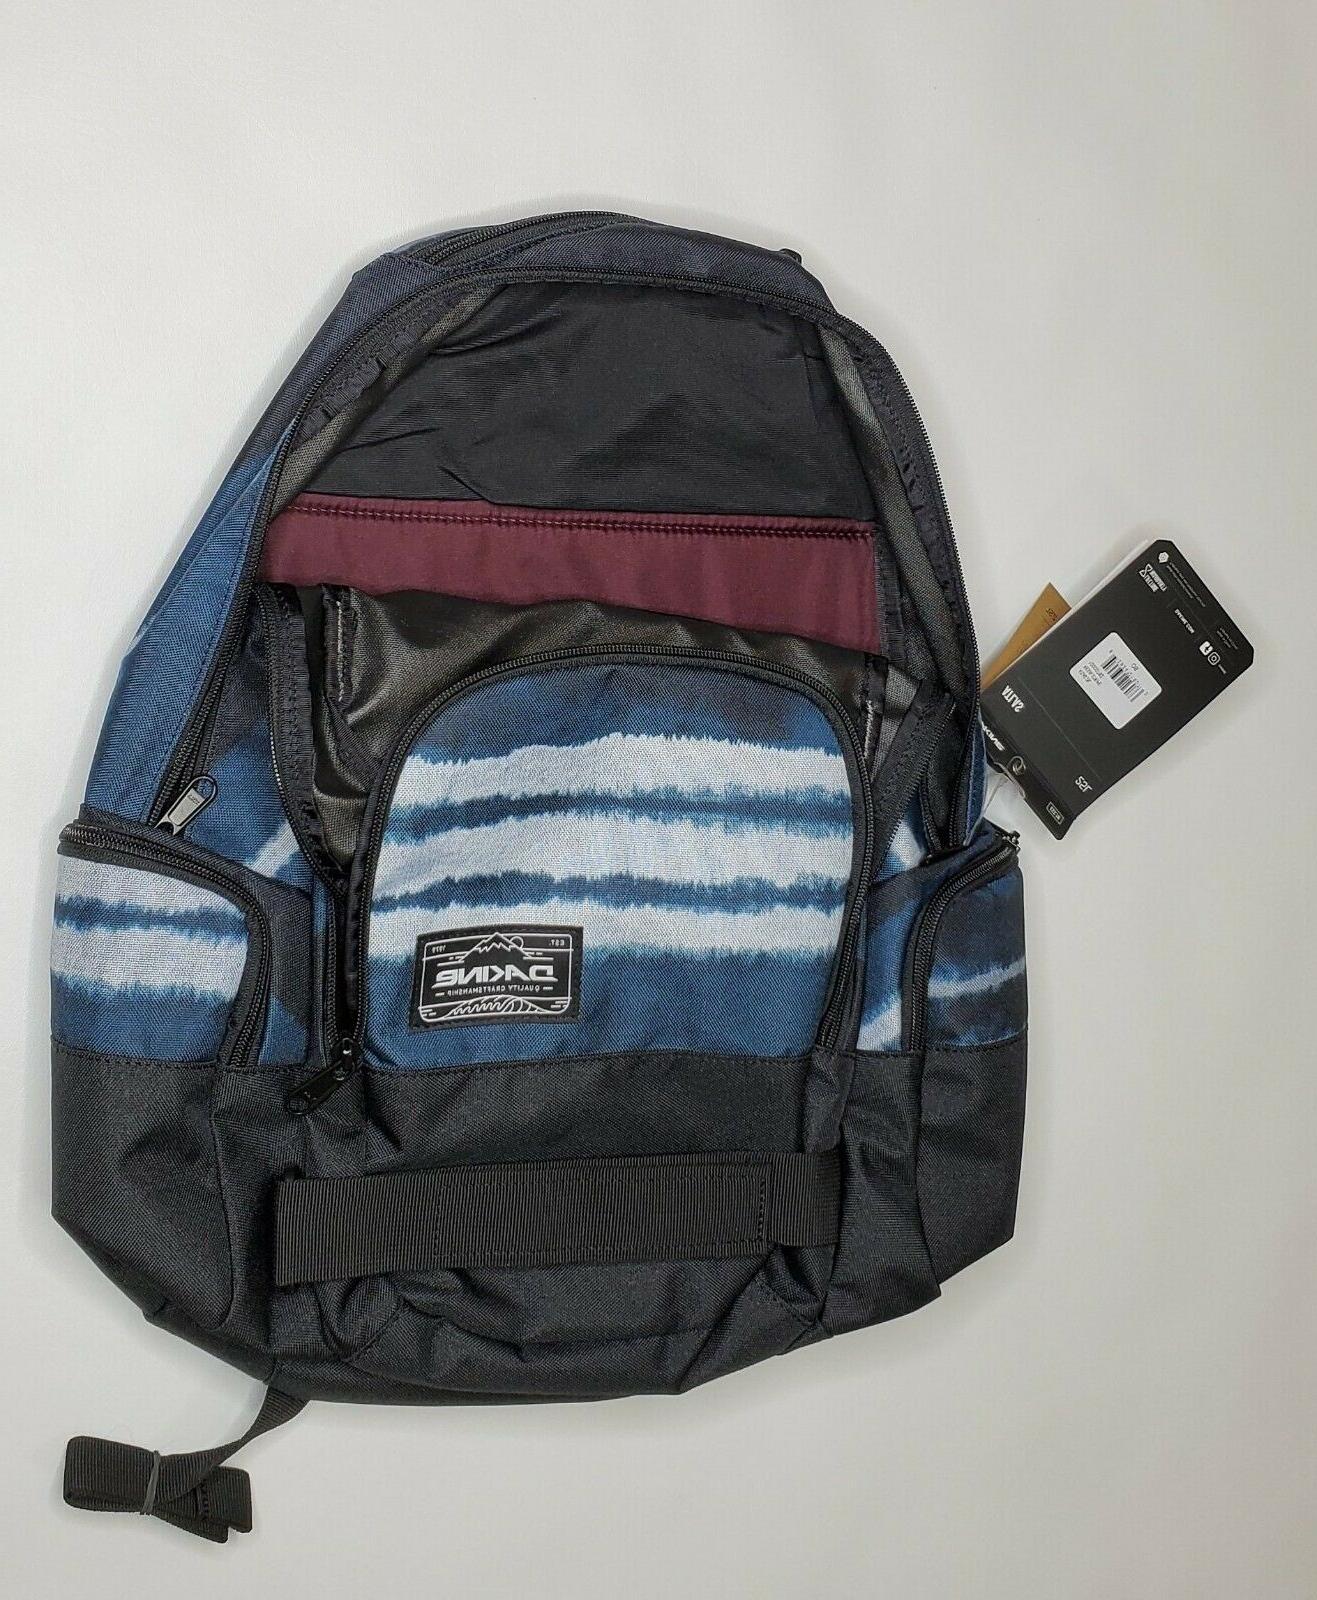 DAKINE ATLAS Backpack Skateboard Carry Sleeve